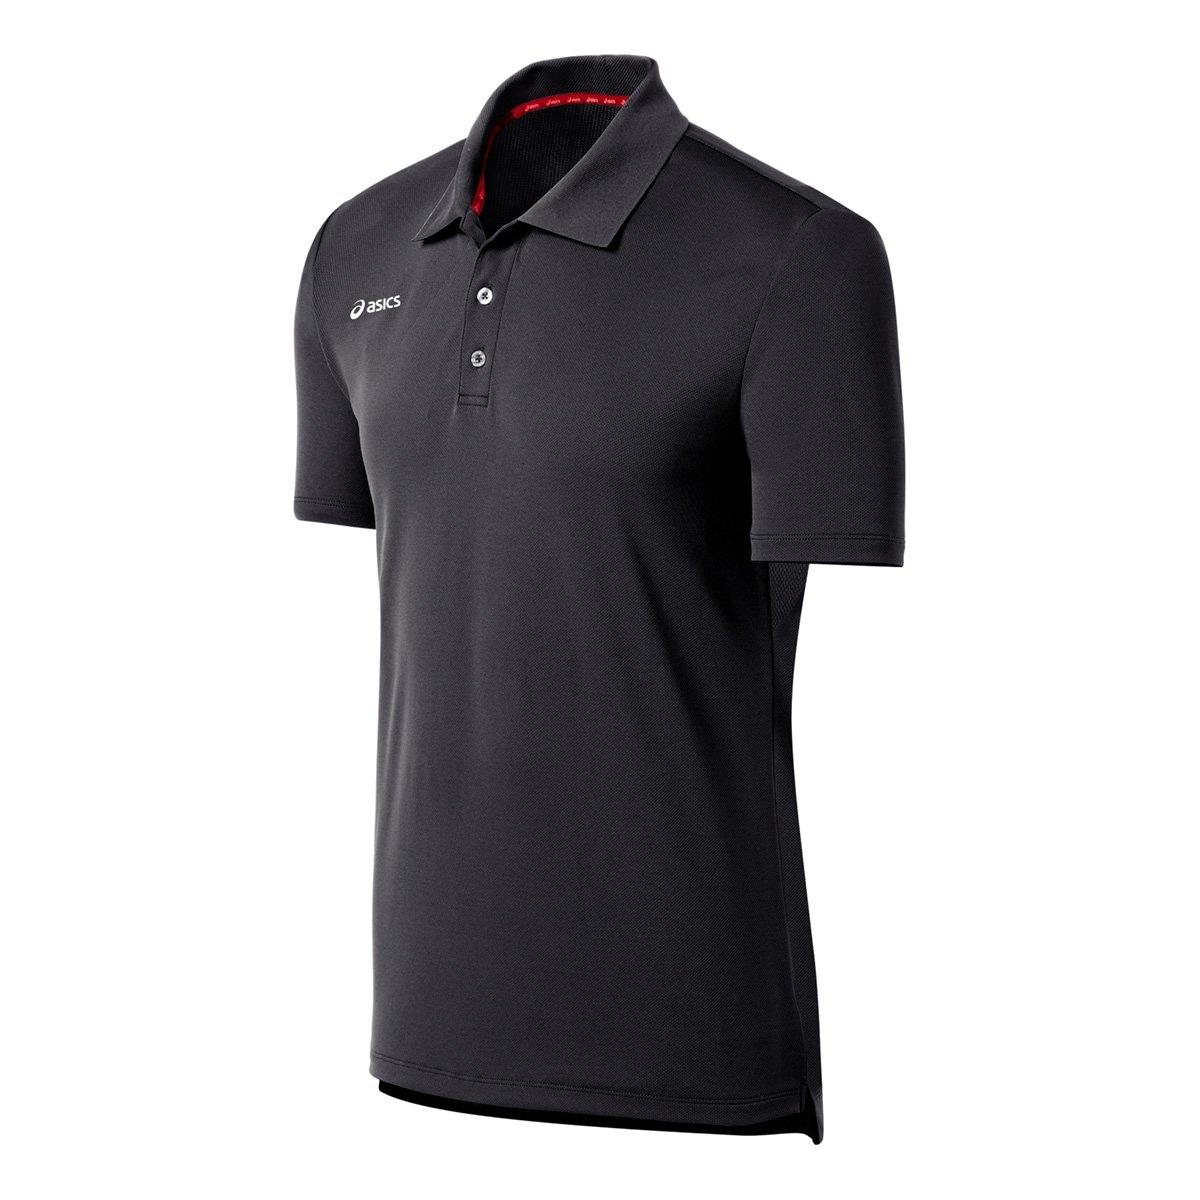 ASICS Men's Team Performance Polo Shirt, Steel Grey, Medium